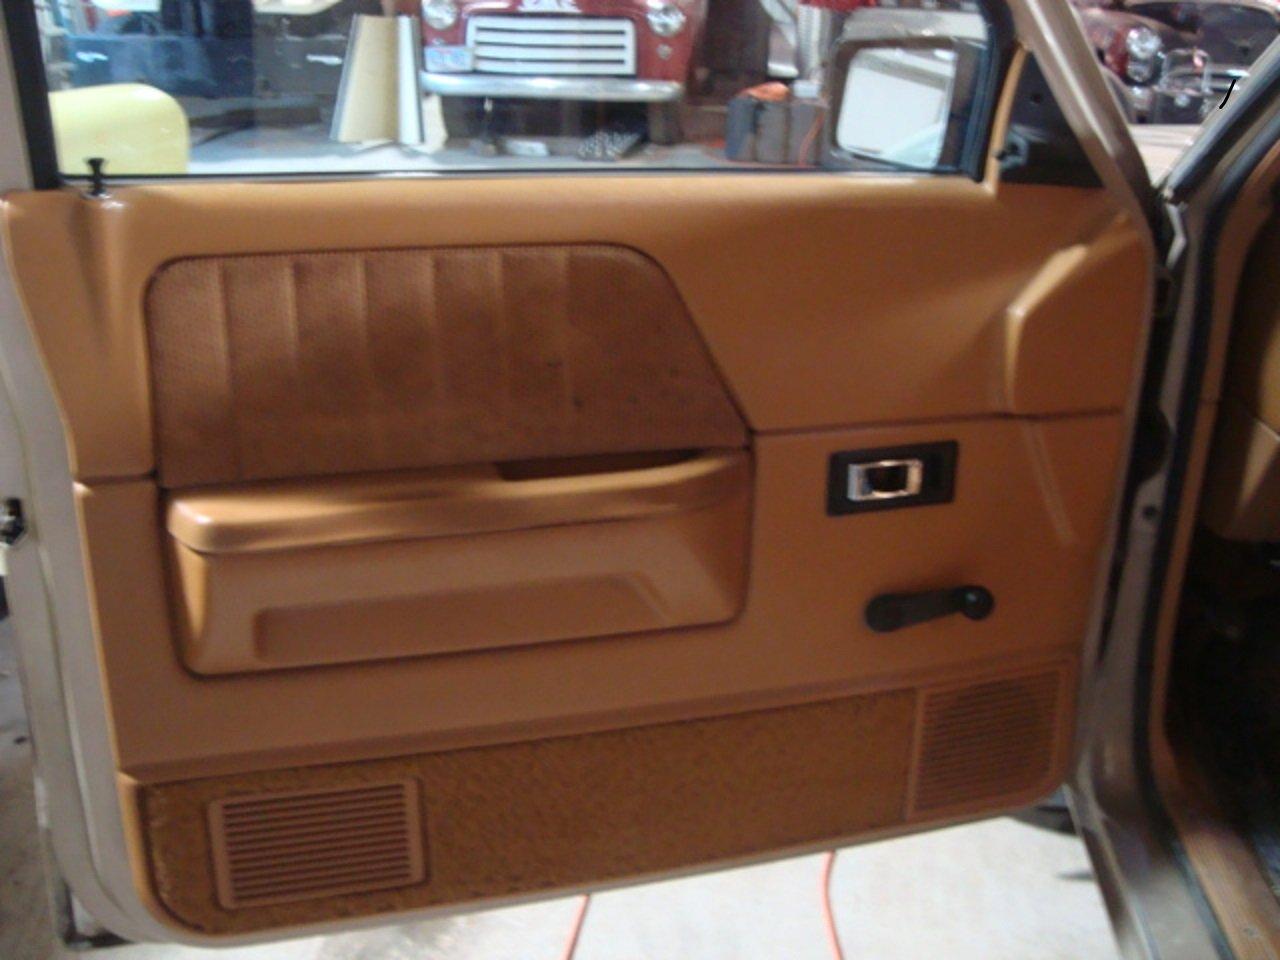 1992 Dodge Dakota Pickup For Sale (picture 5 of 6)